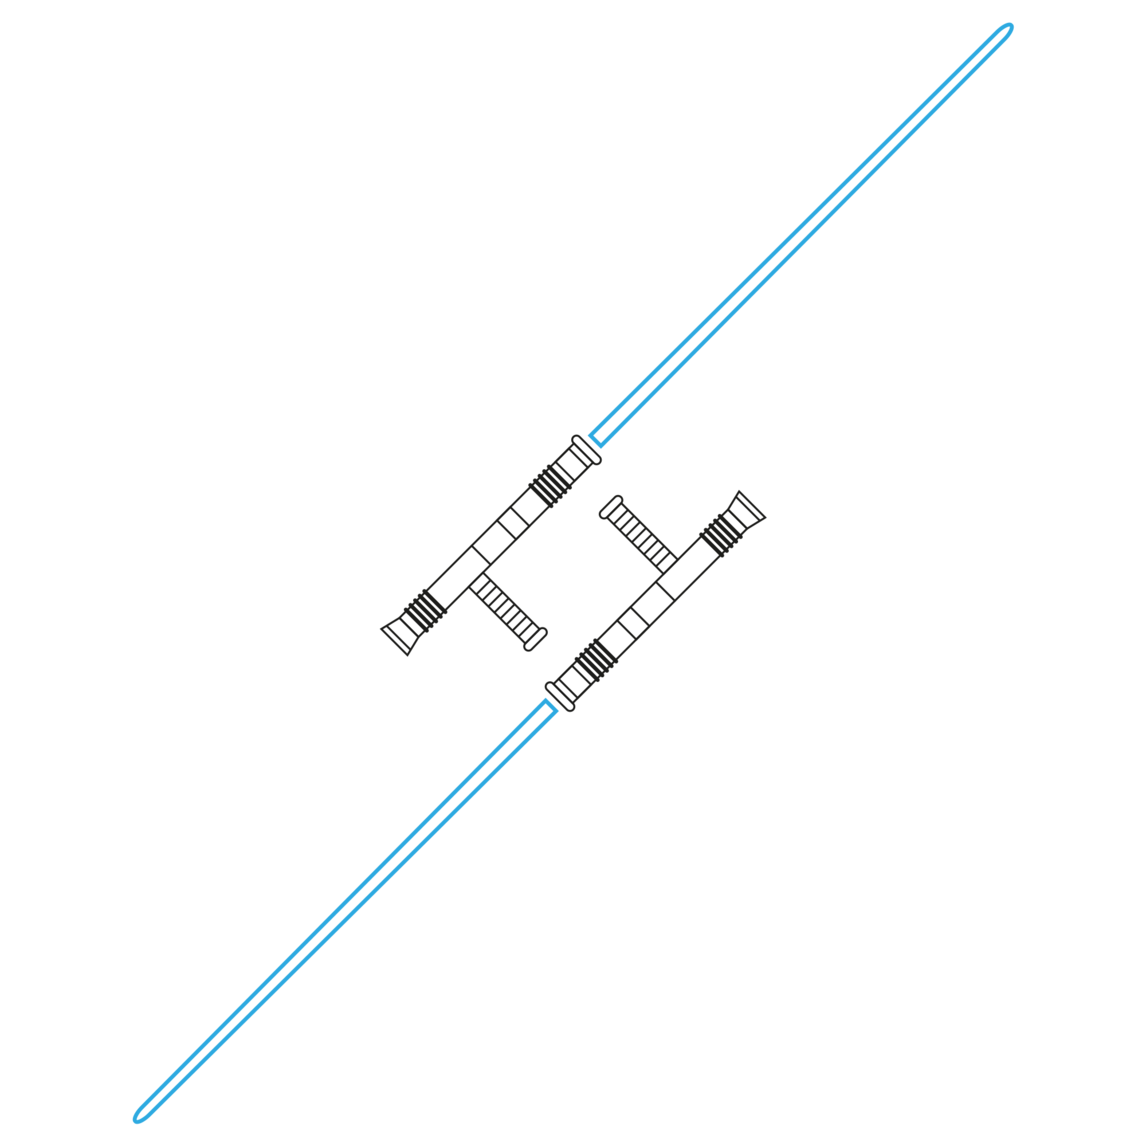 Star Wars Saber Variations By Abb D Choudhury Guard Shoto